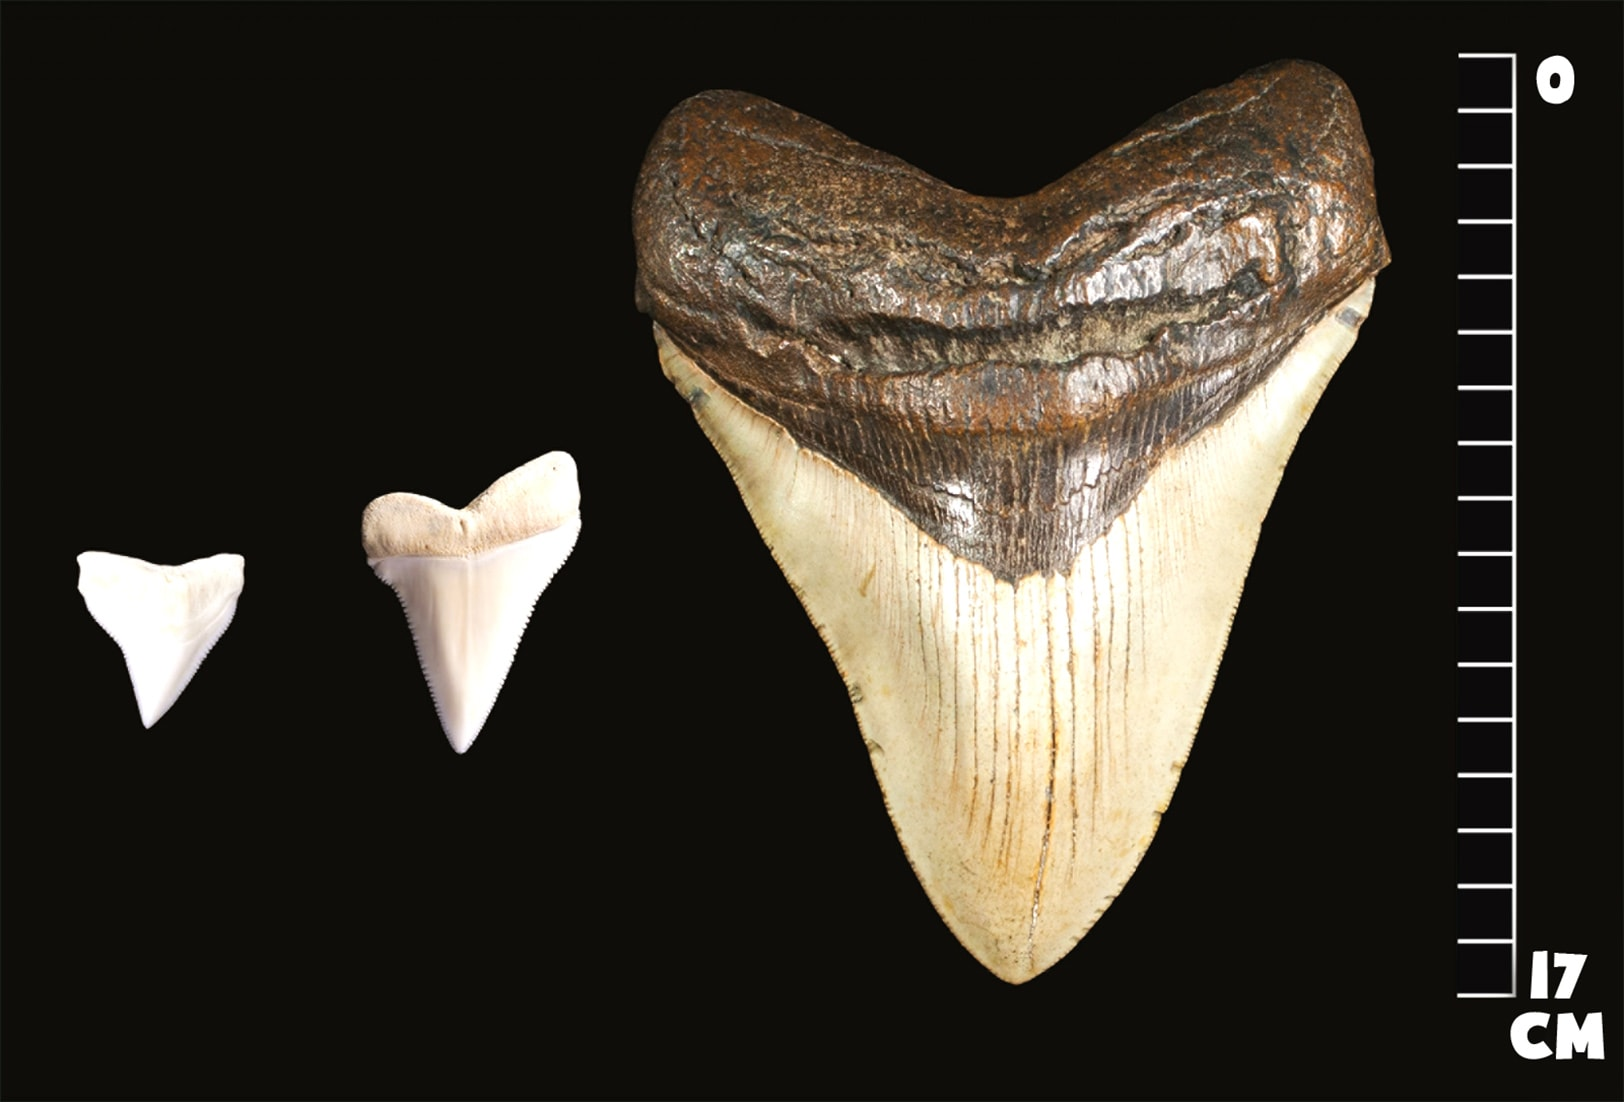 Зубы мегалодона и белой акулы